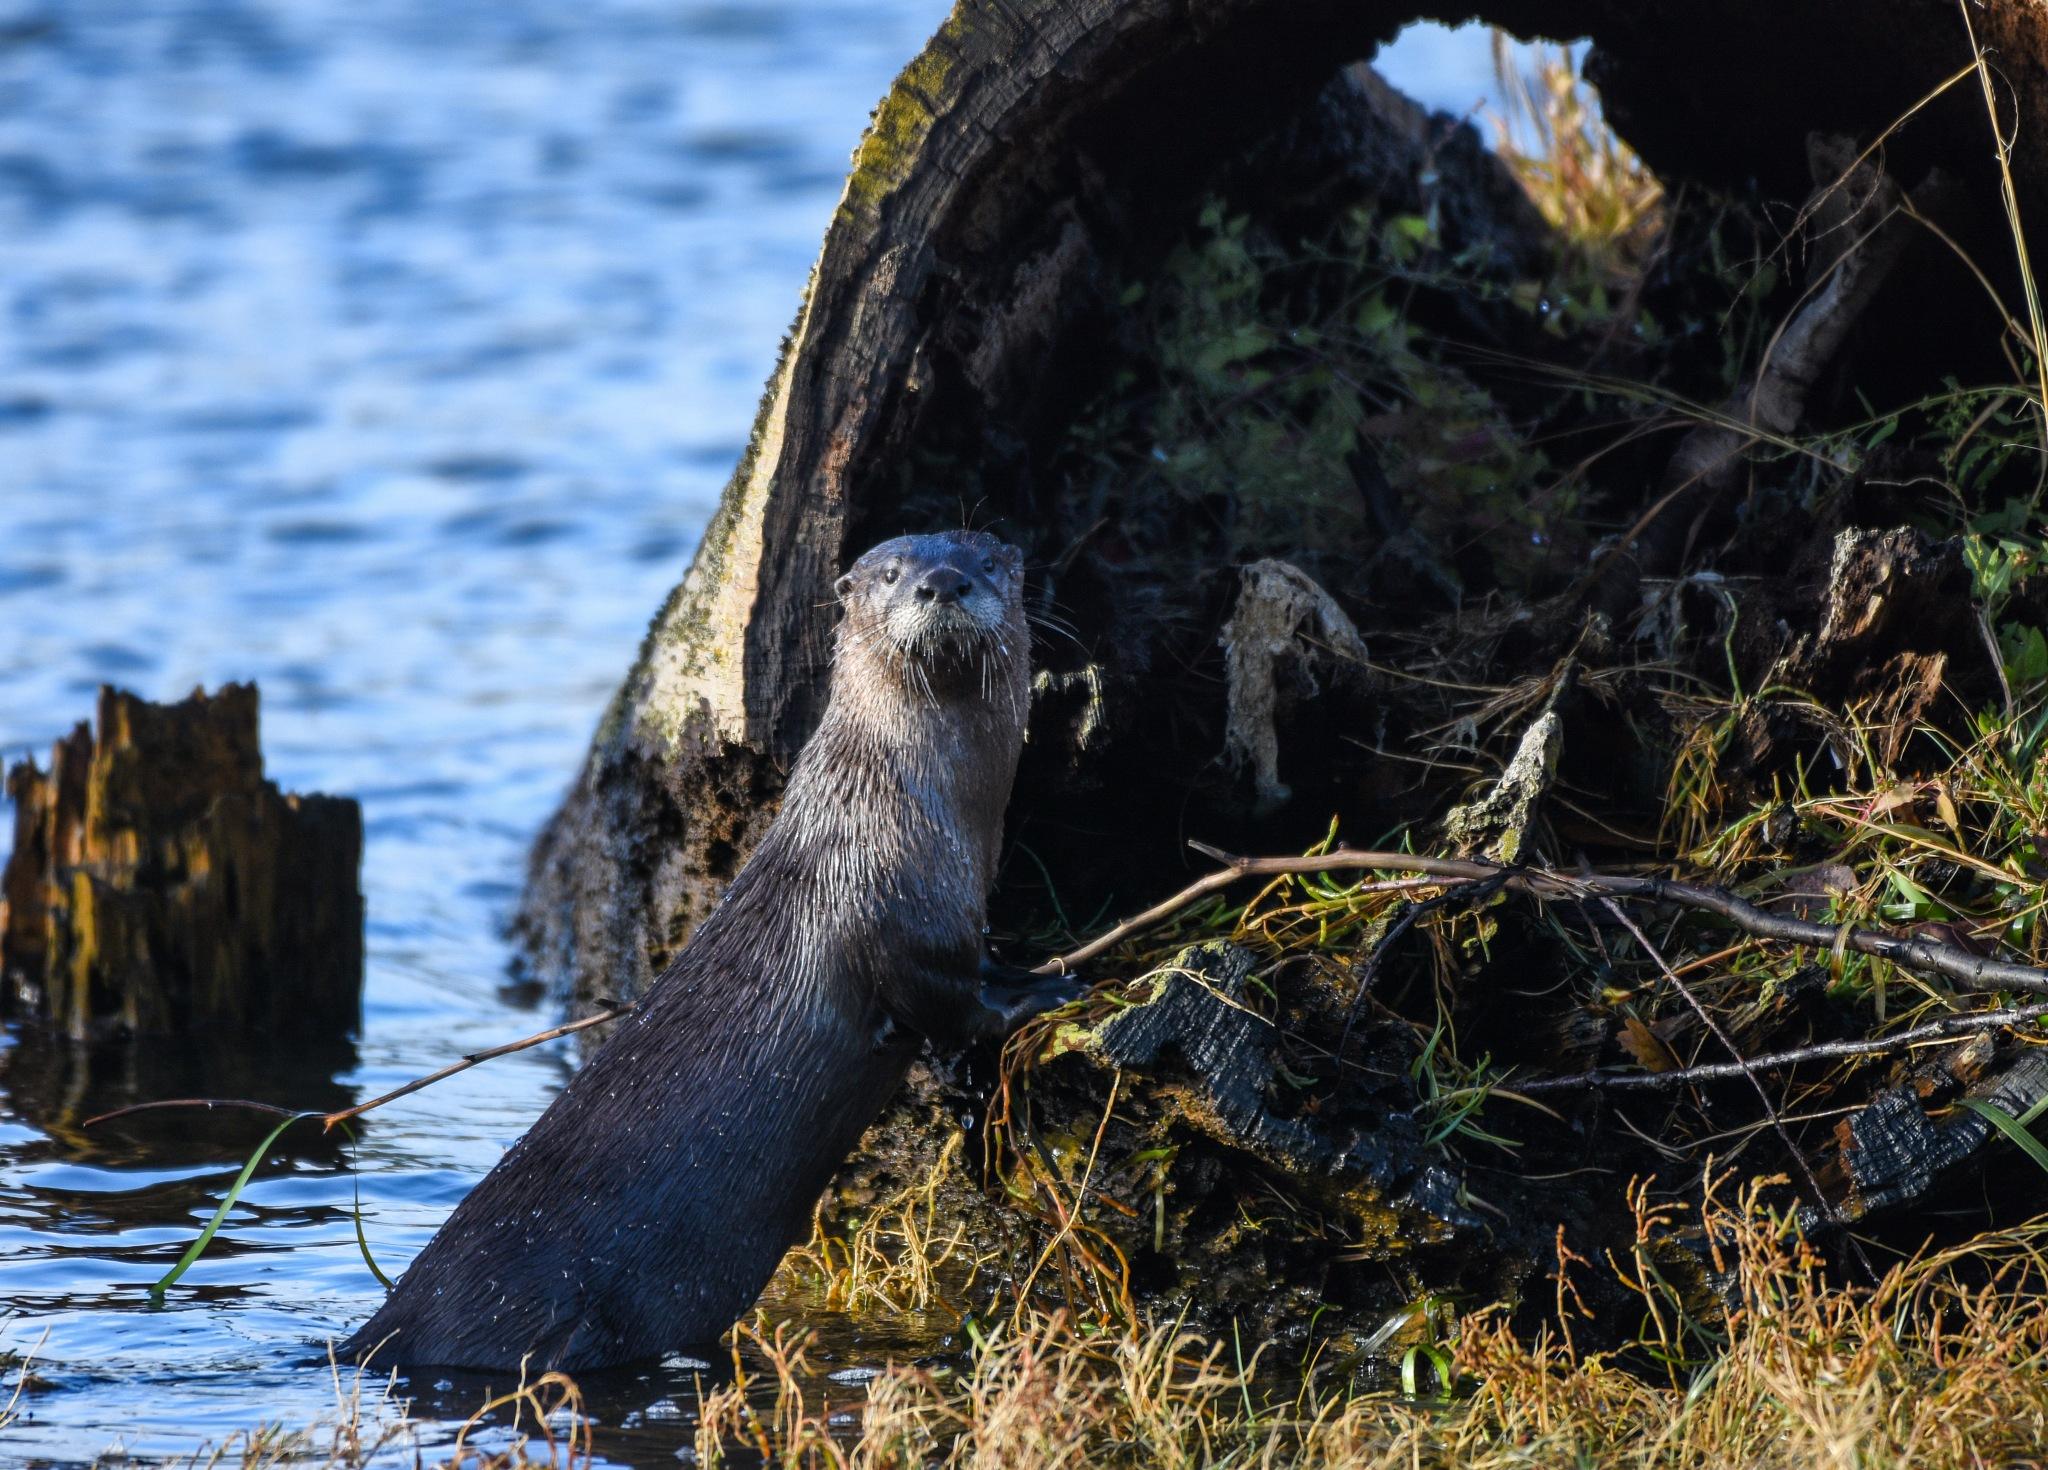 Posing Otter by Robert Stenseth